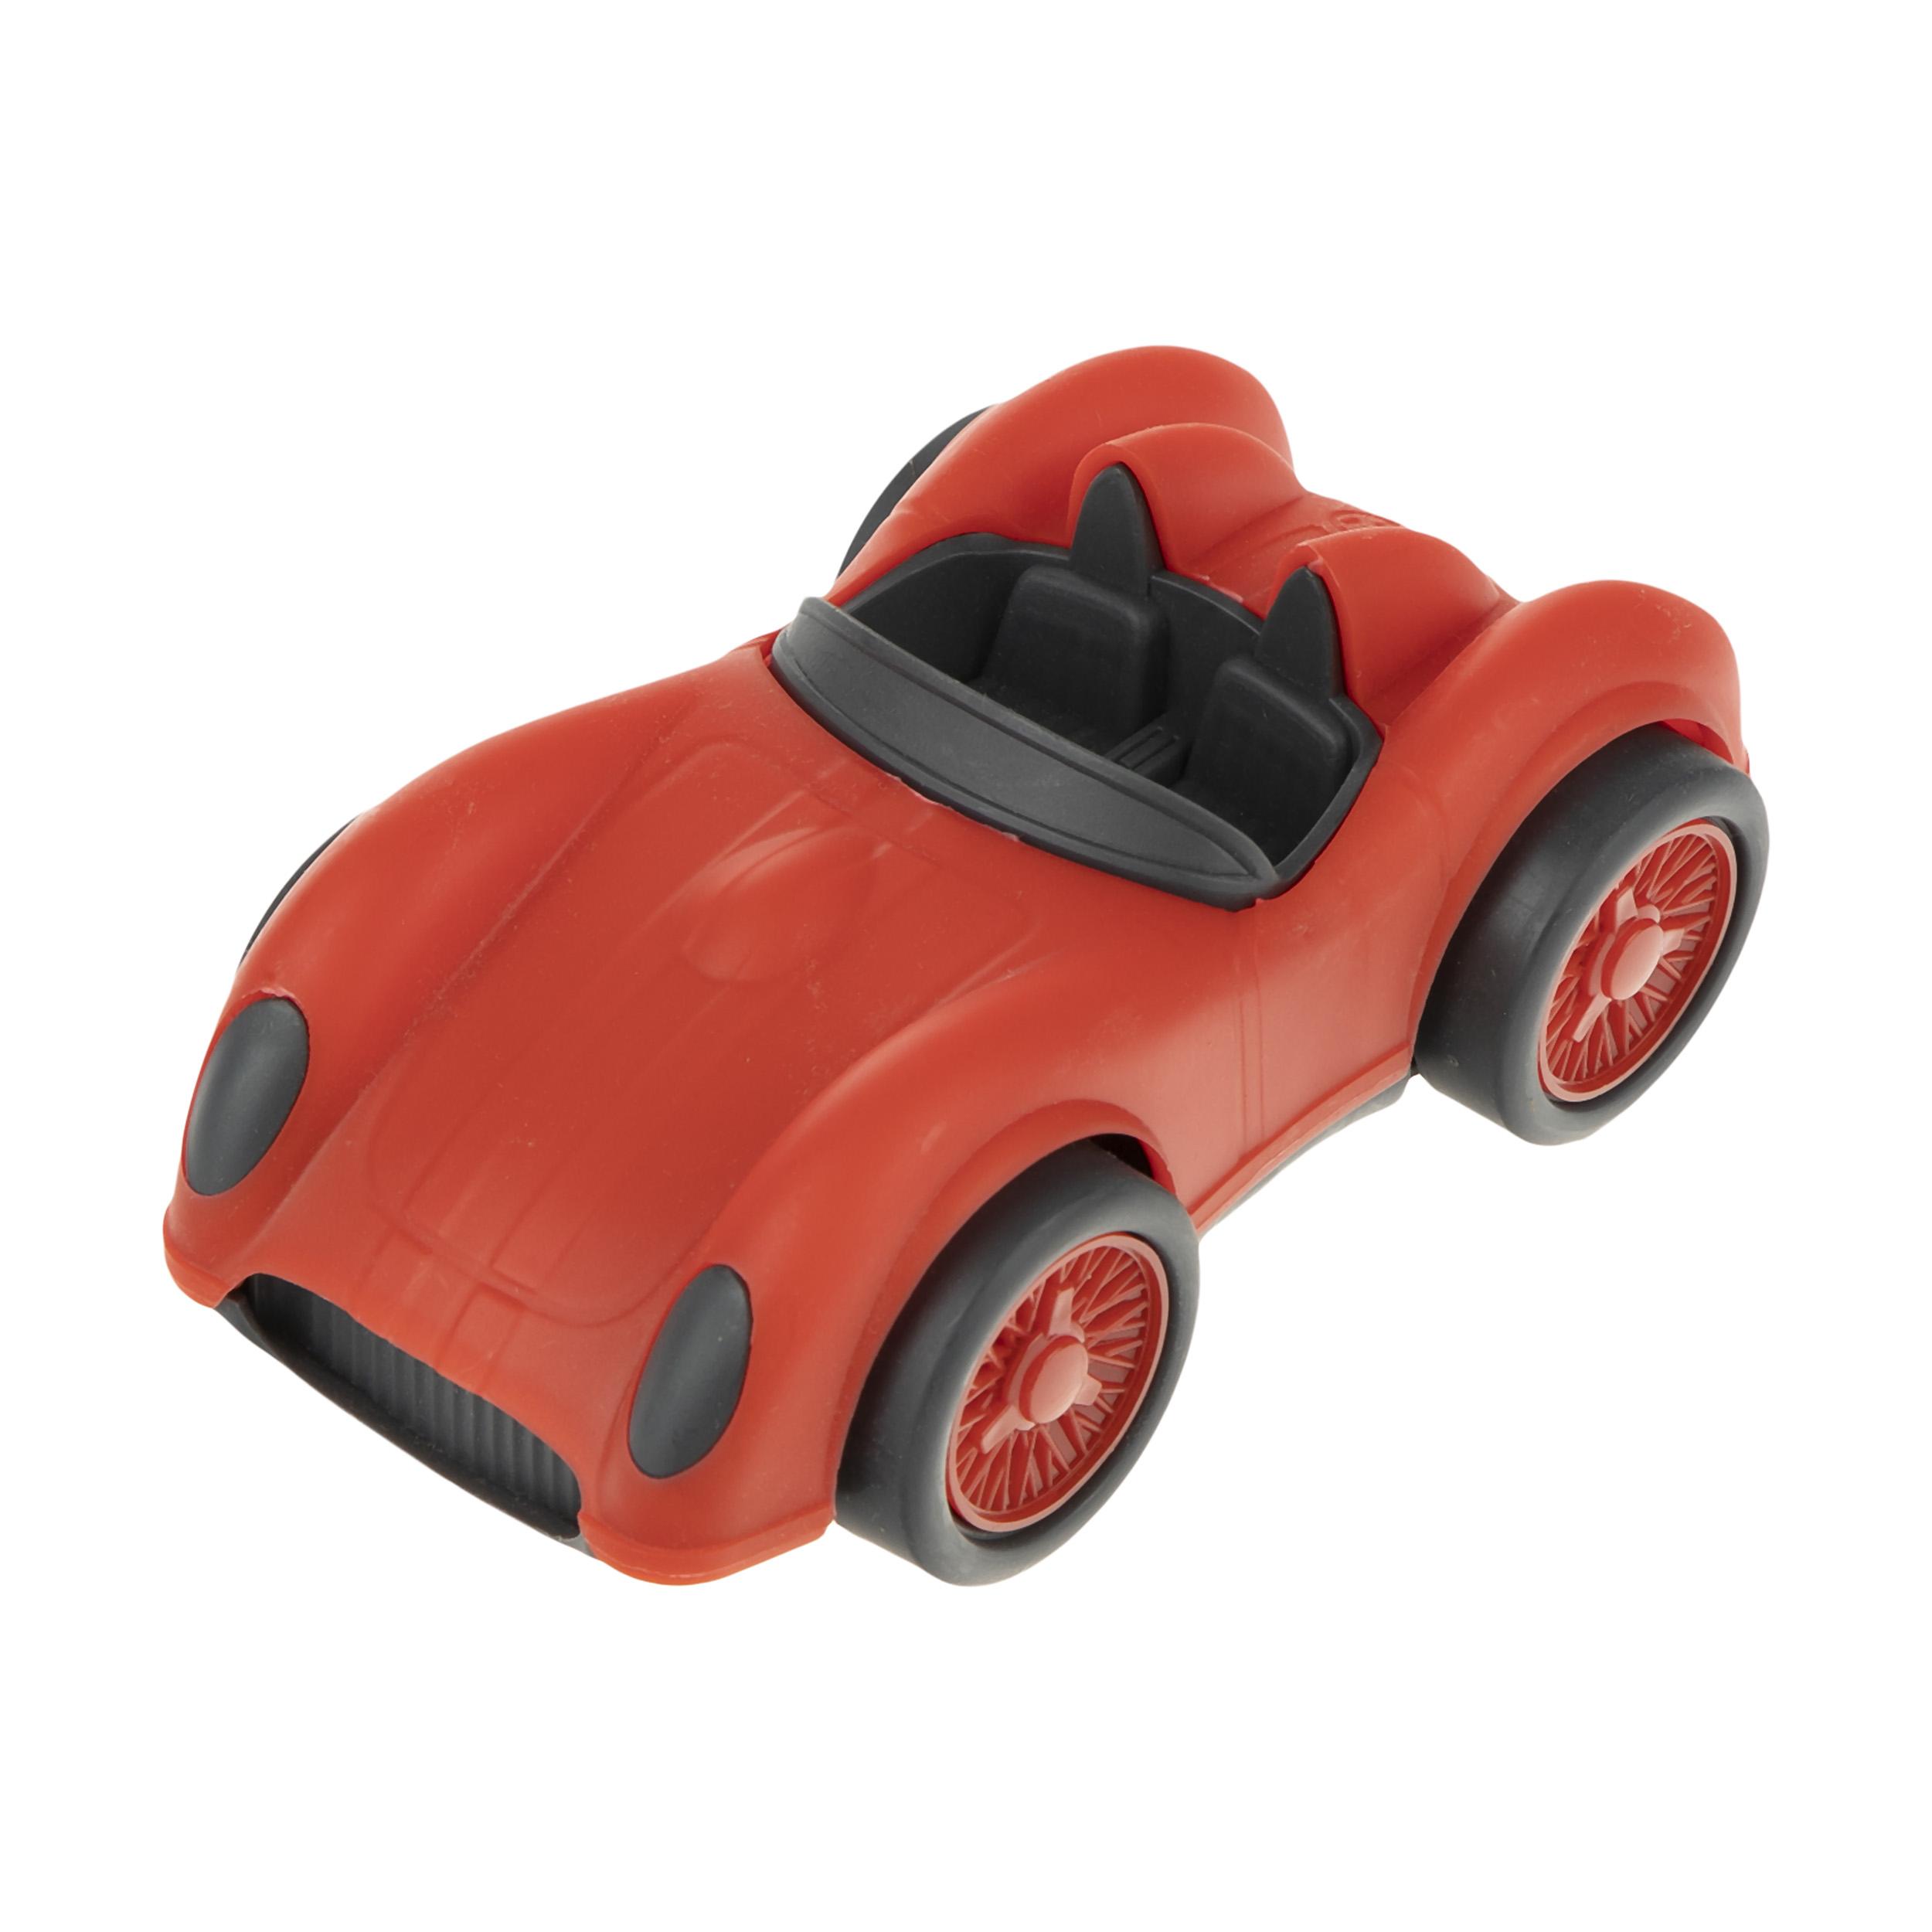 خرید                     ماشین بازی نیکو تویز مدل RACER